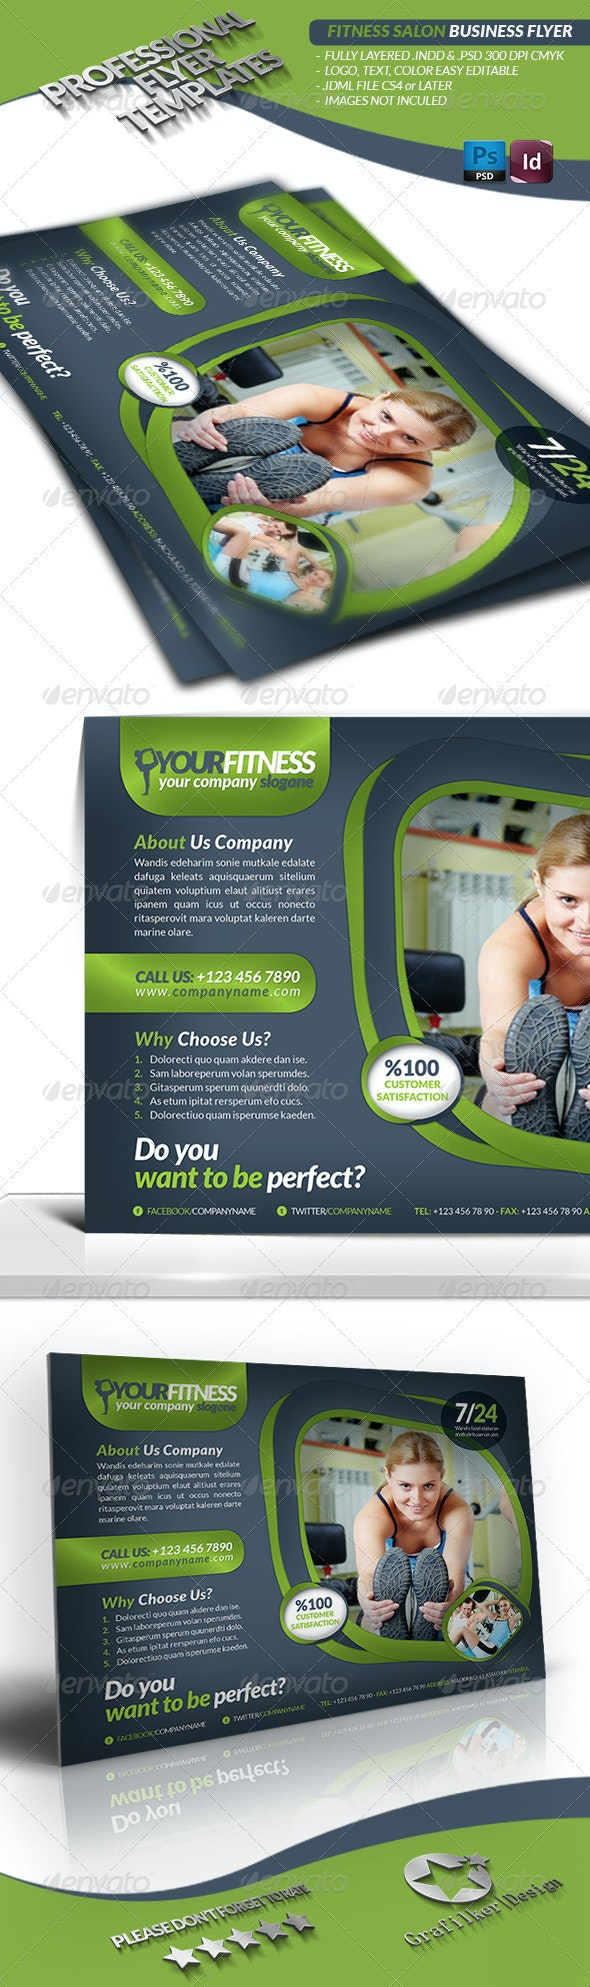 Fitness Salon Business Flyer - Flyers Print Templates